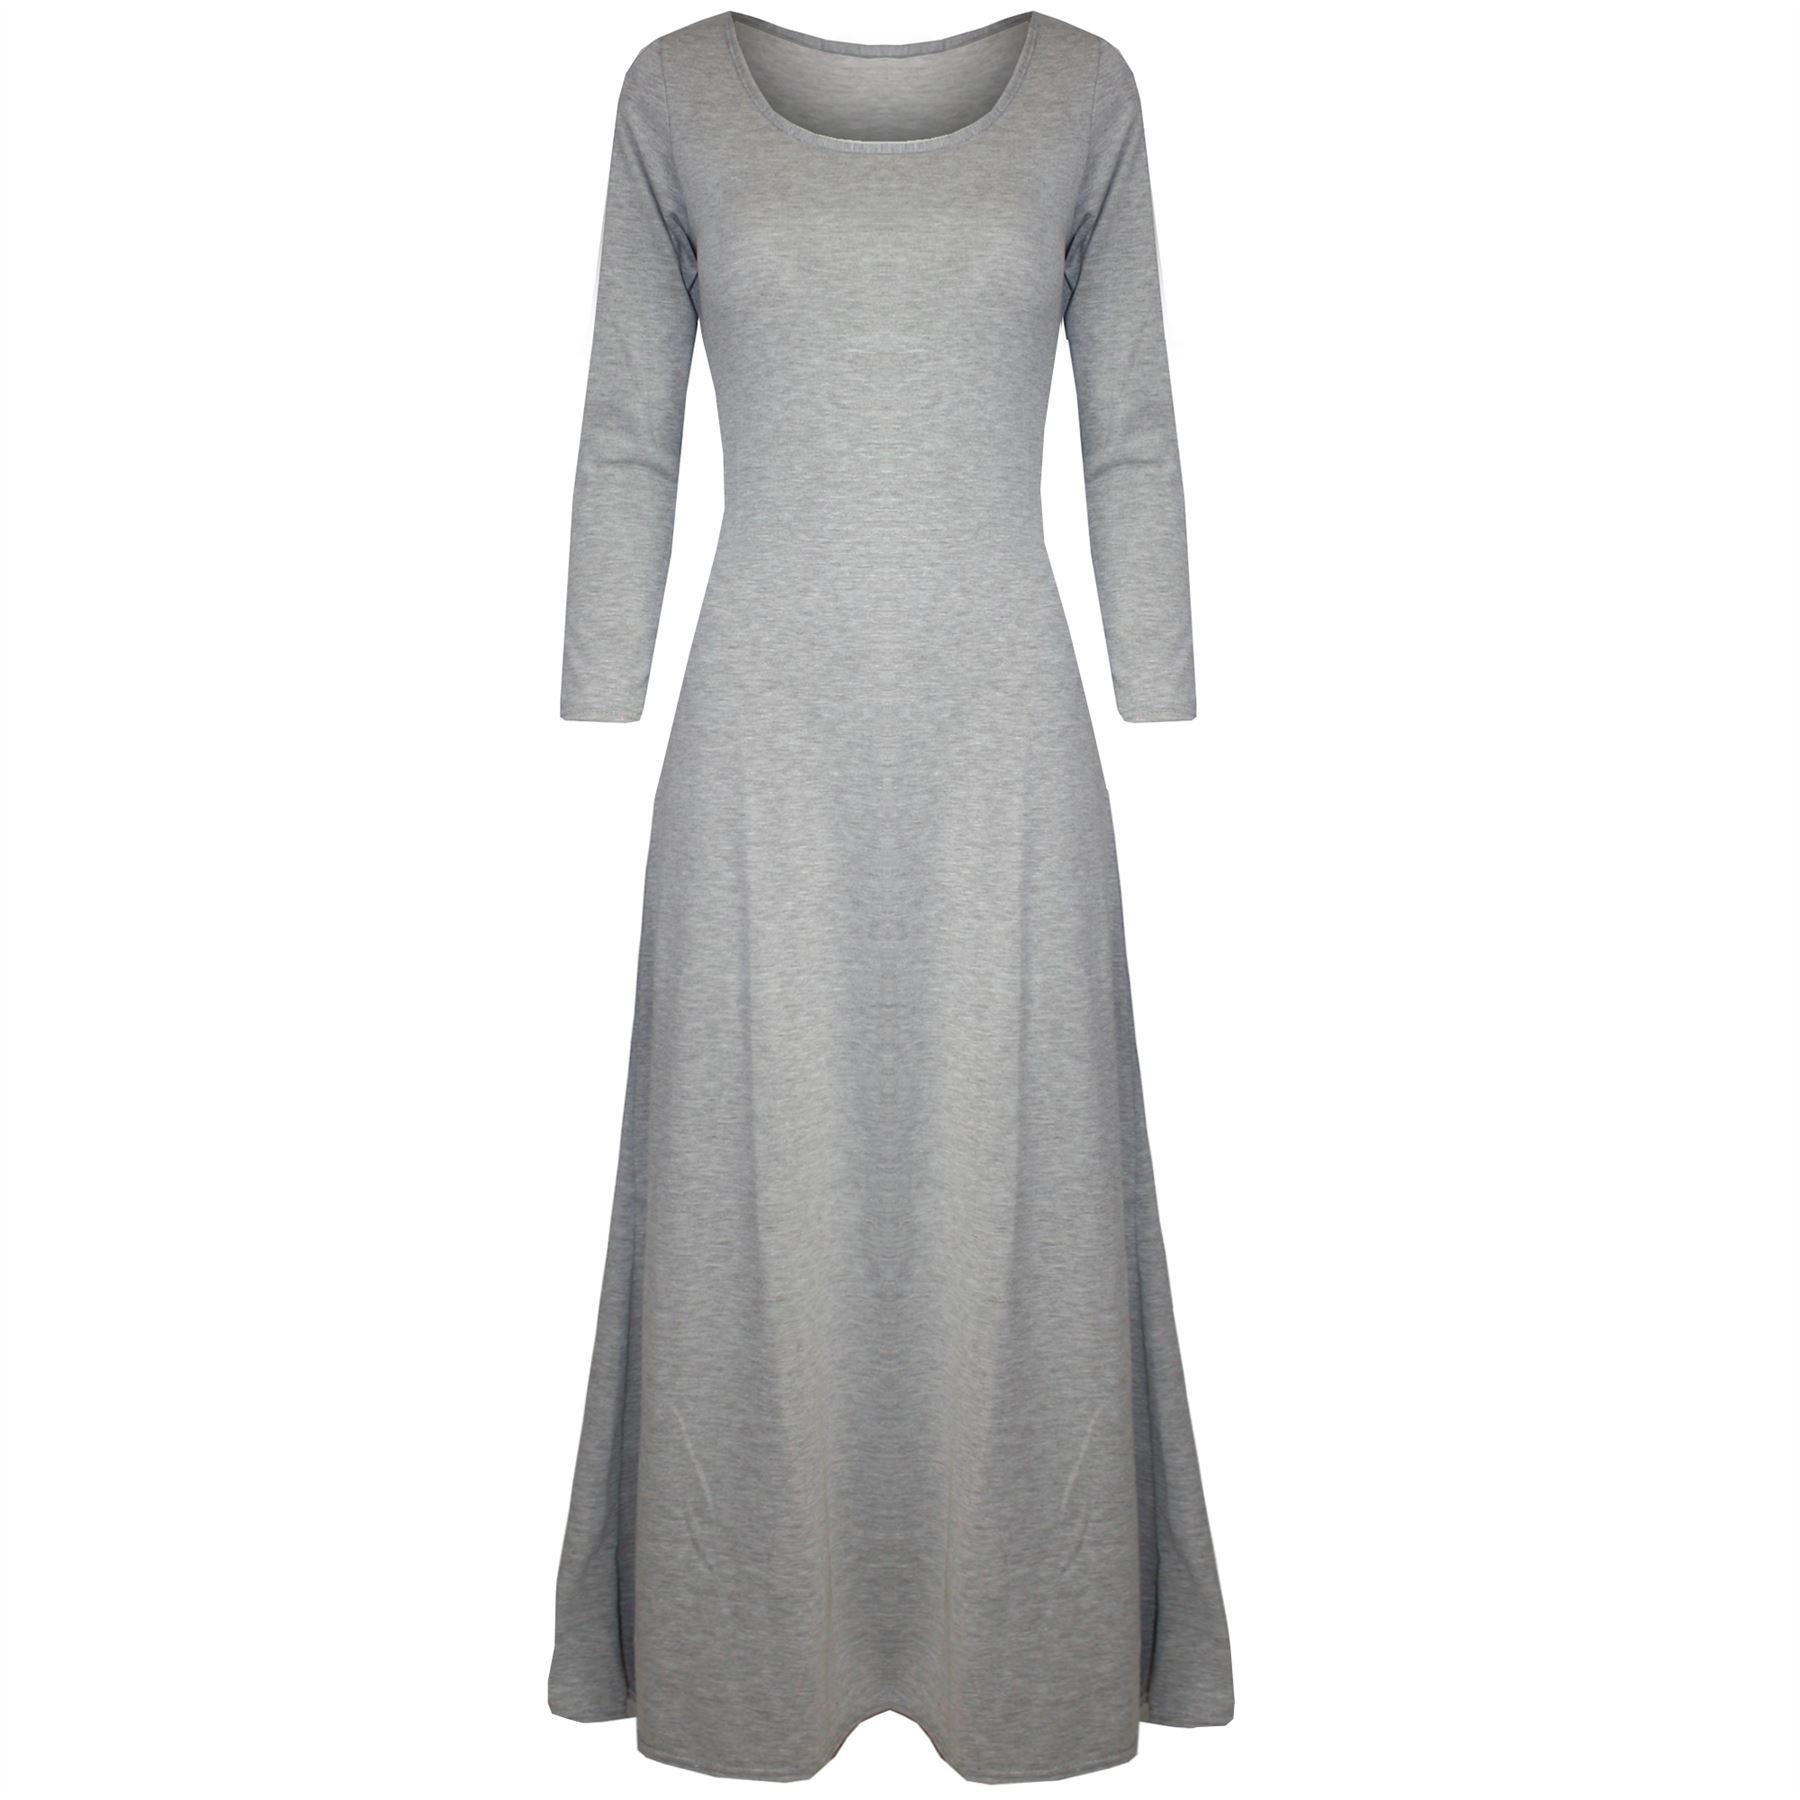 Celebrity Dresses Ebay 9